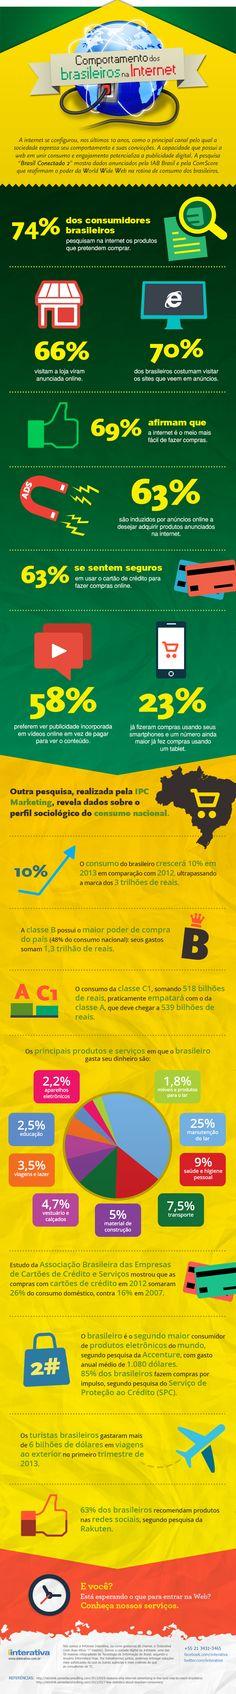 Infográfico - Comportamento dos Brasileiros na Internet - Busca e Mídia